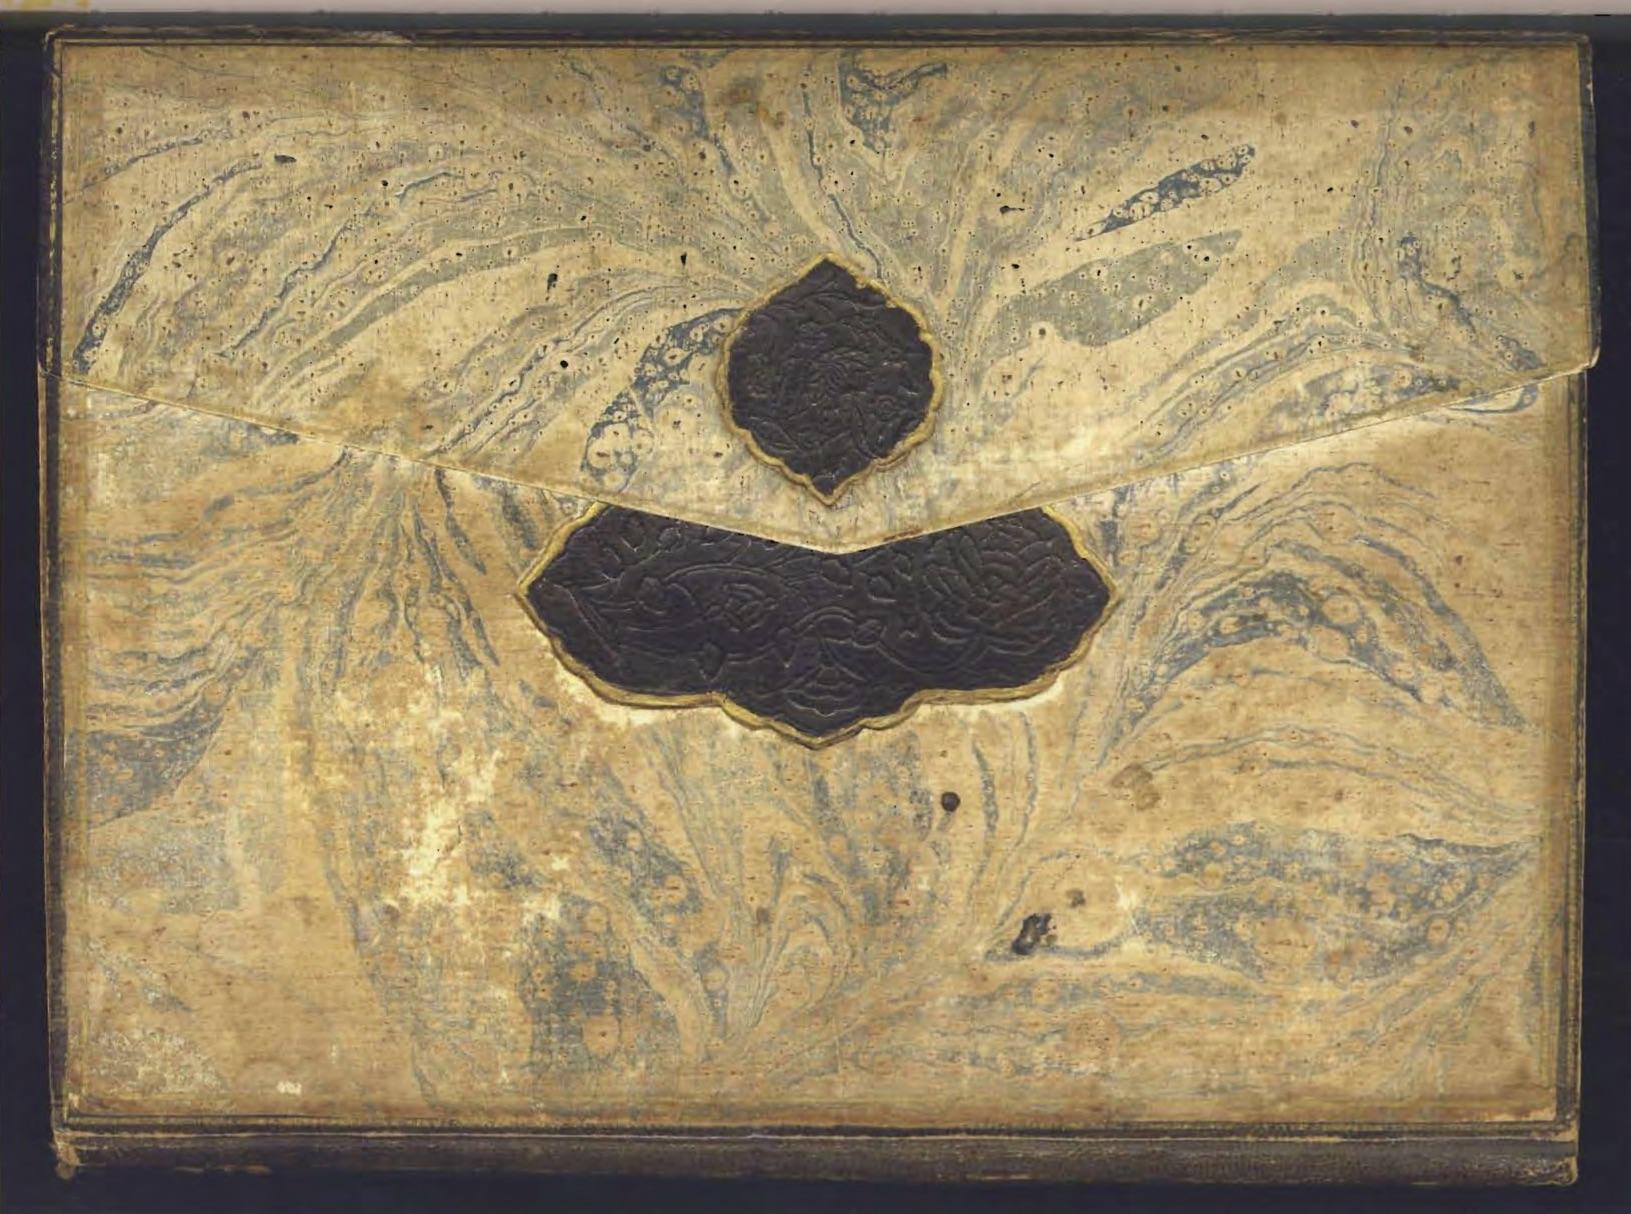 Binding made of blue-and-white marbled paper, Ibrahim Muteferrika's  Tarihu'l-Hindi'l-Garbi el-Musemma bi Hadis-i Nev, 1142/1730, 22 x 16 cm, DR 403, M825. The Lilly Library, Indiana Univeristy, Bloomington.